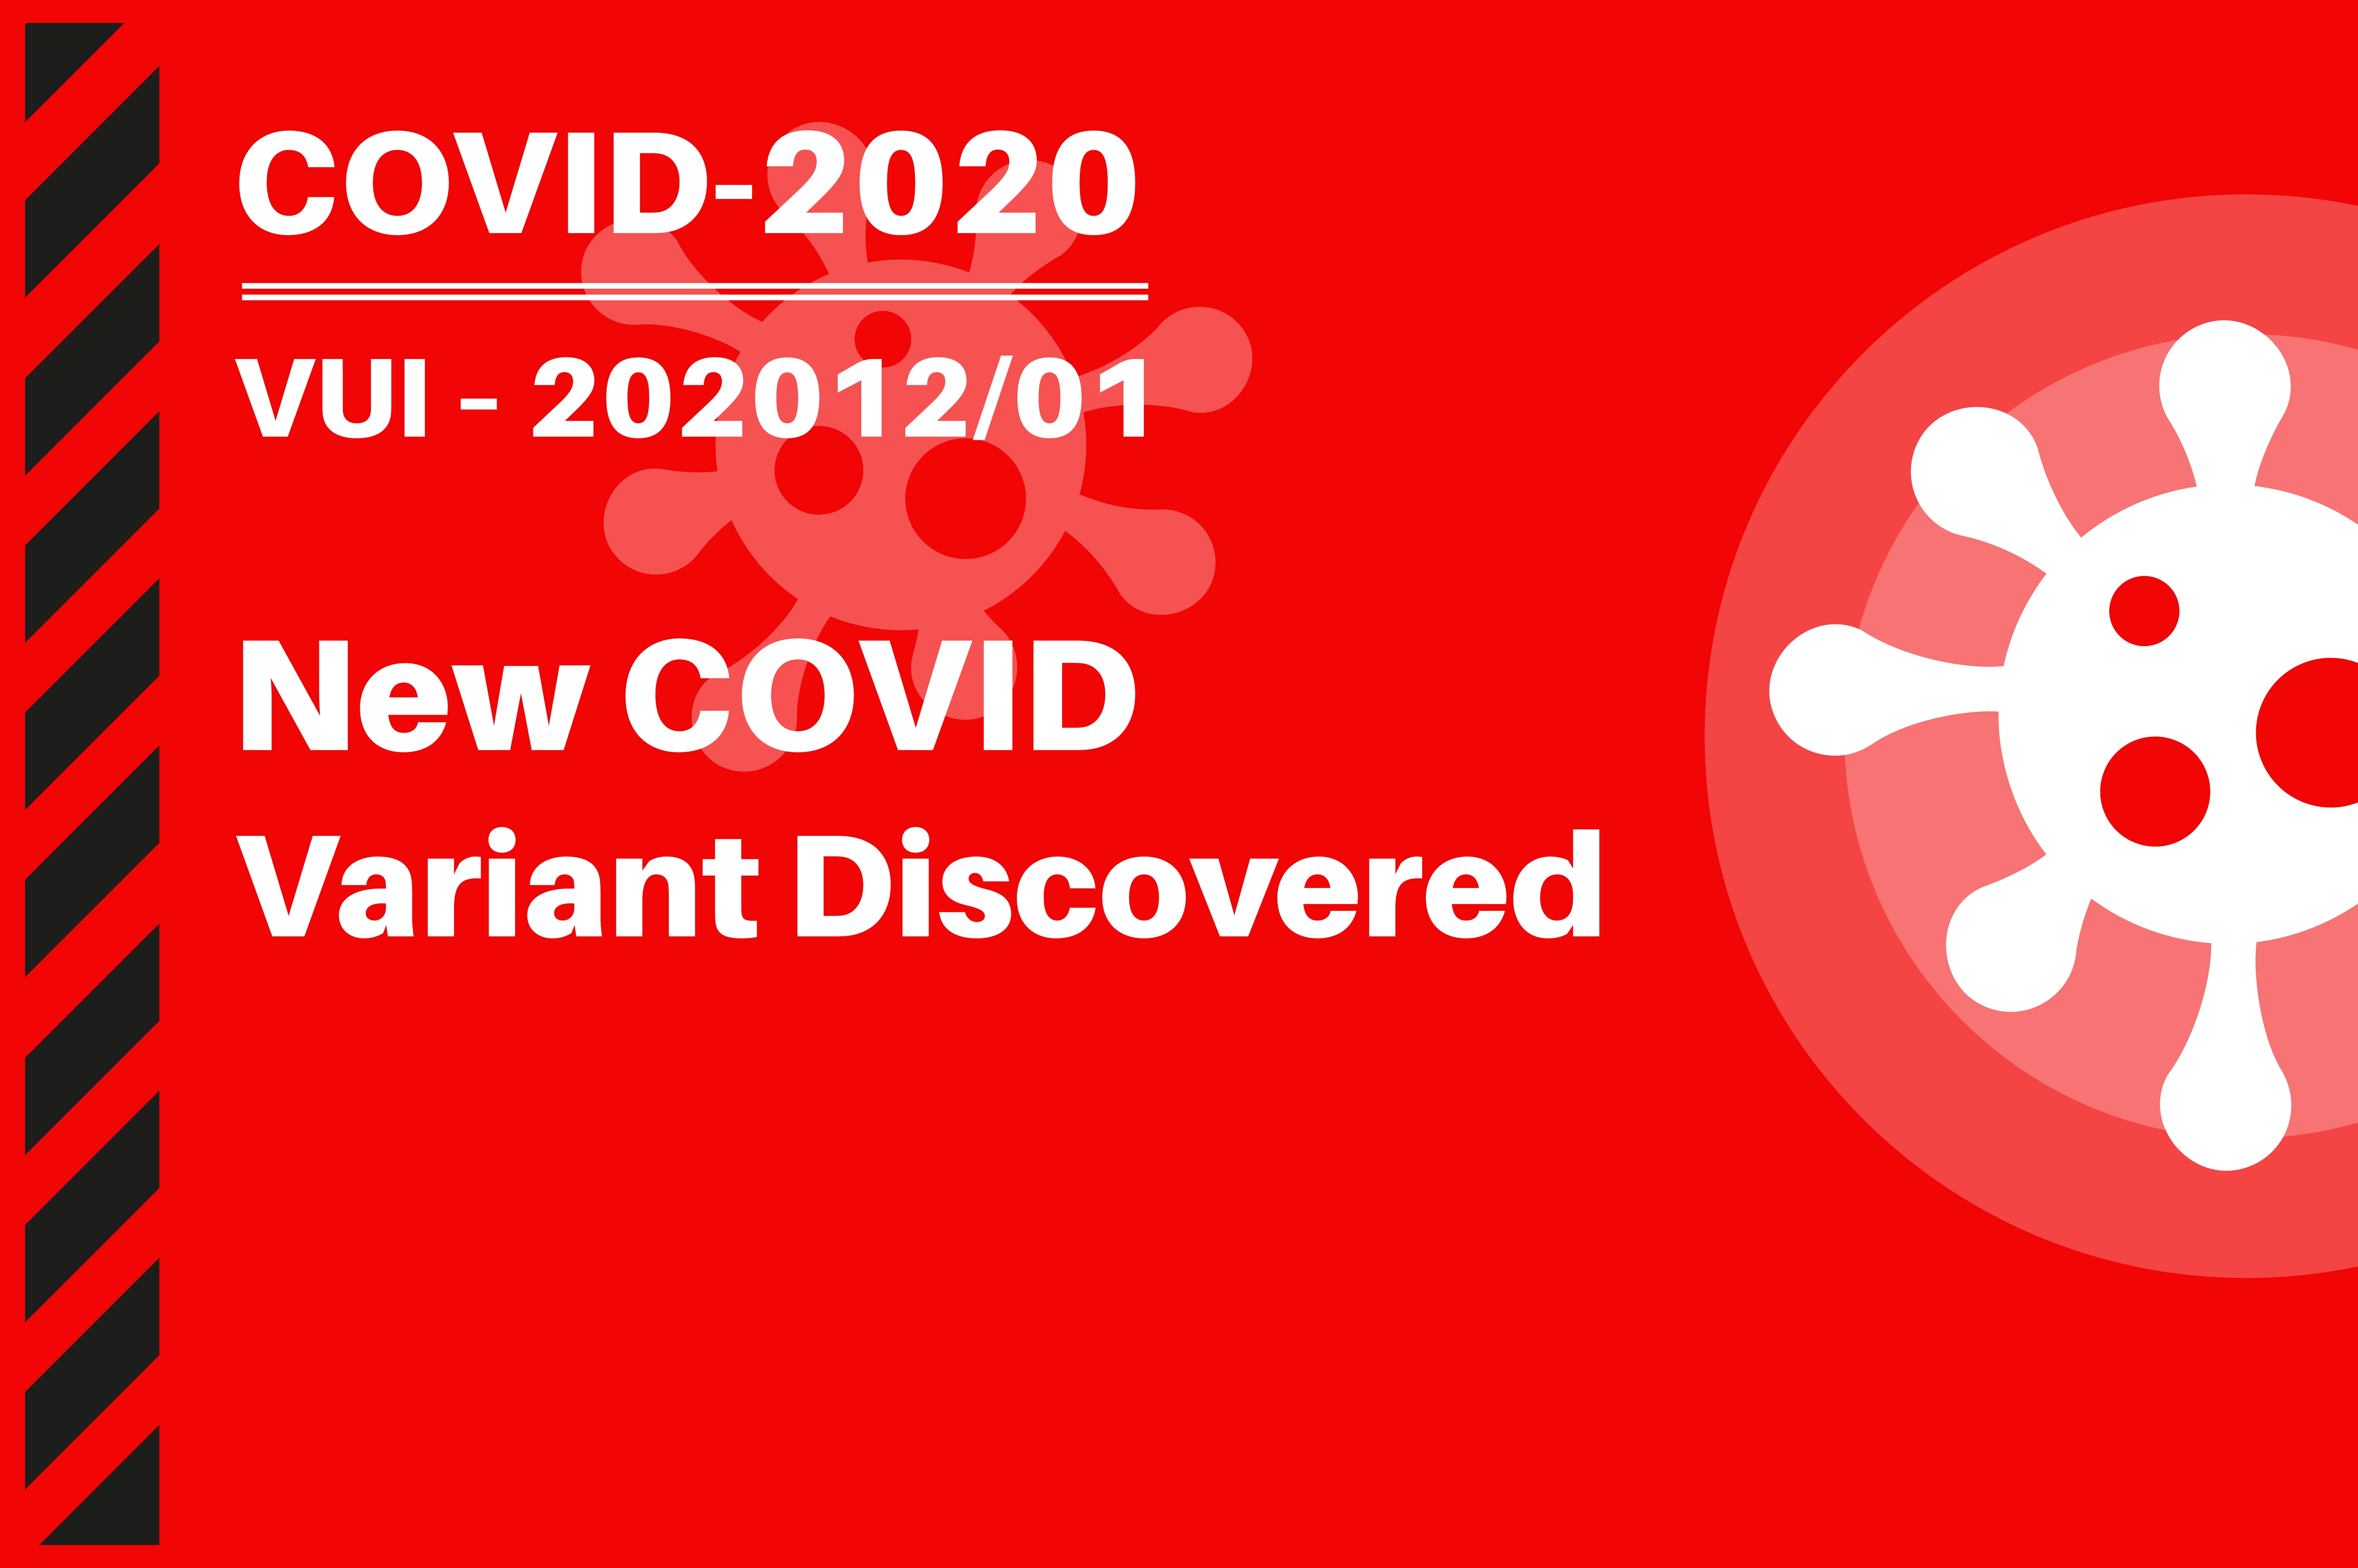 AB ANALITICA SARS-COV-2 nuova variante VUI-202012/01 o lineage B.1.1.7.